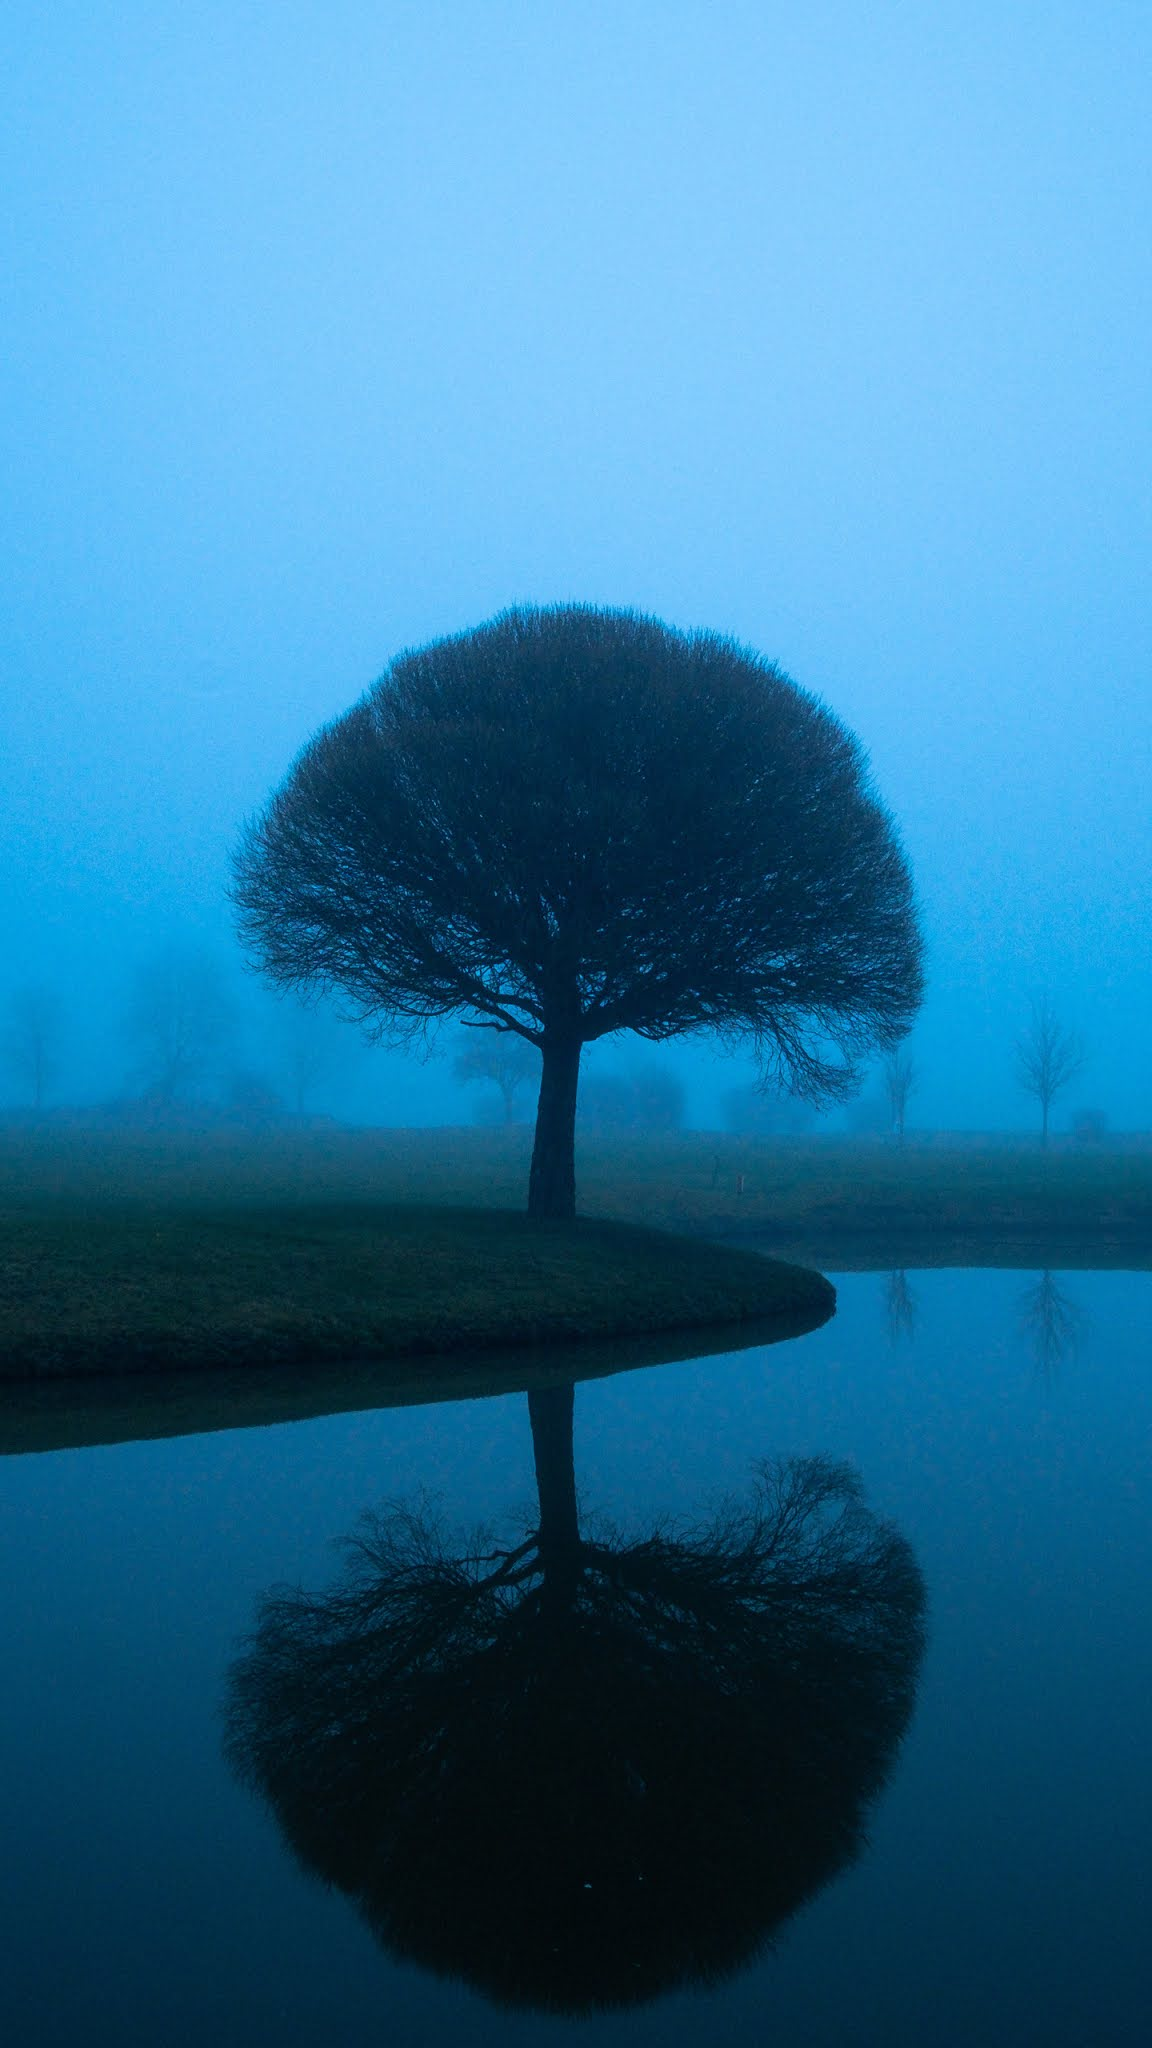 Tree Mistscape mobile wallpaper